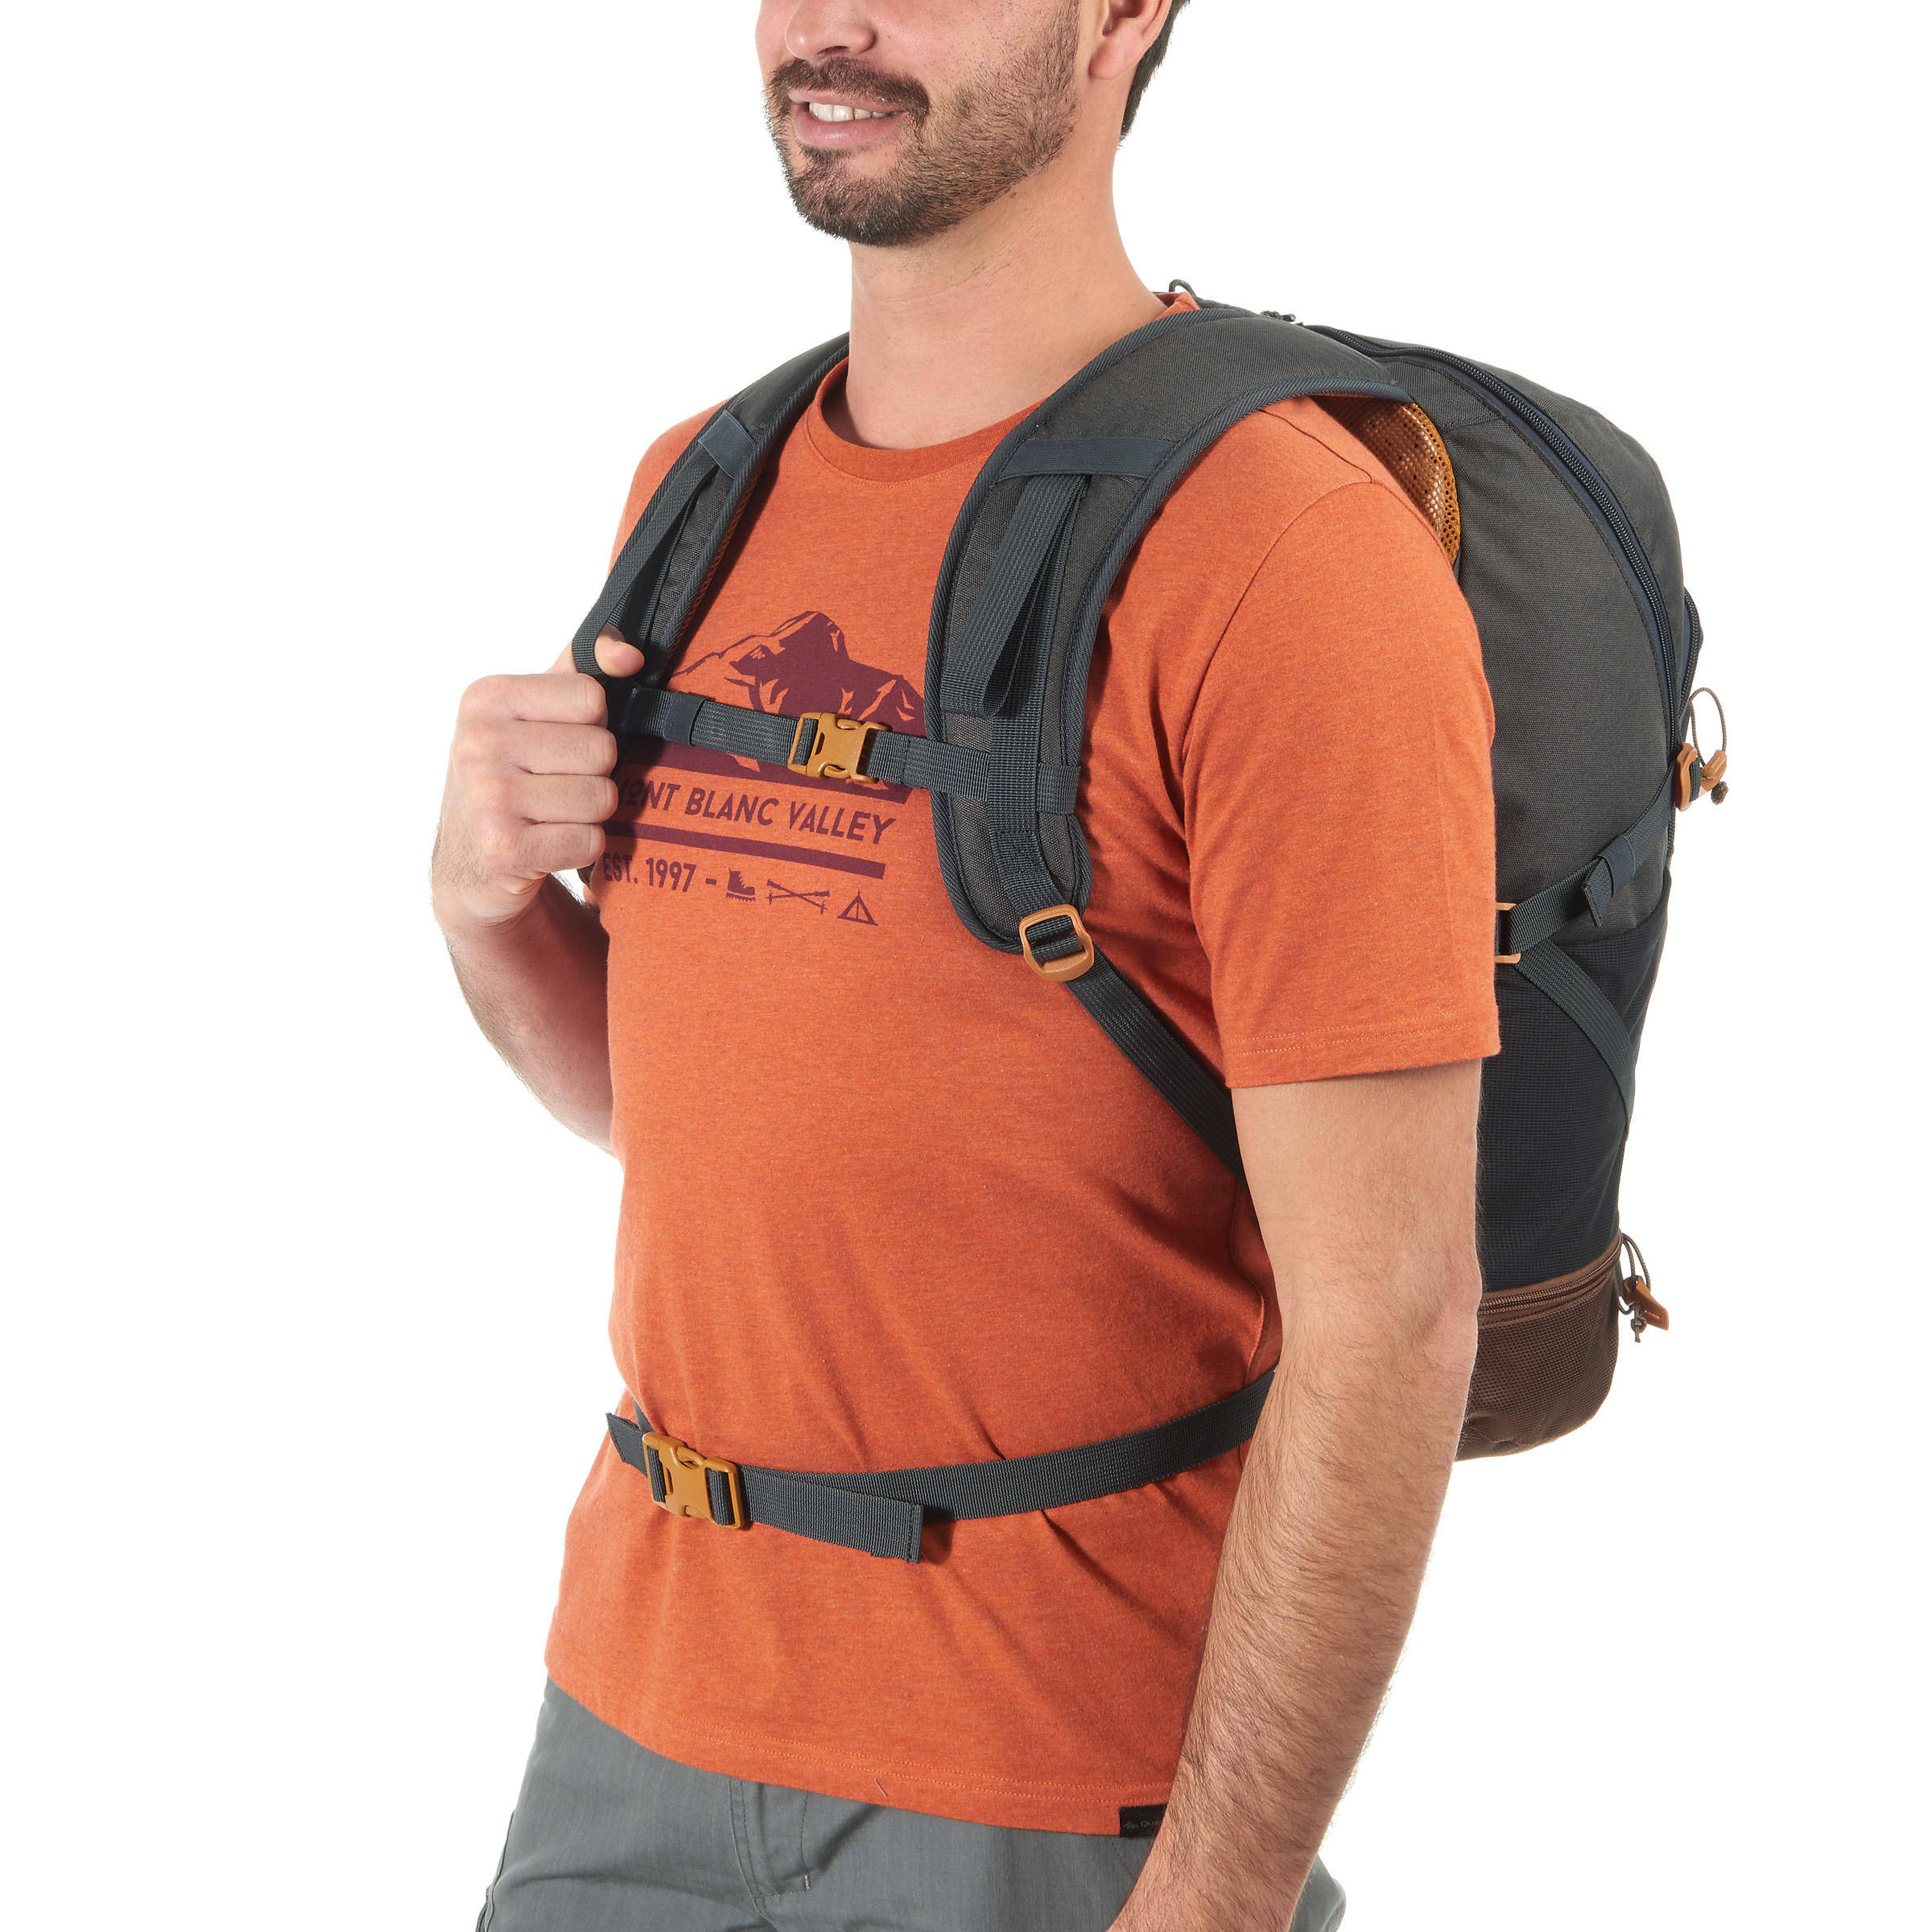 2941b8433045 Quechua Nh500 30l Hiking Backpack Dark Grey   The Shred Centre